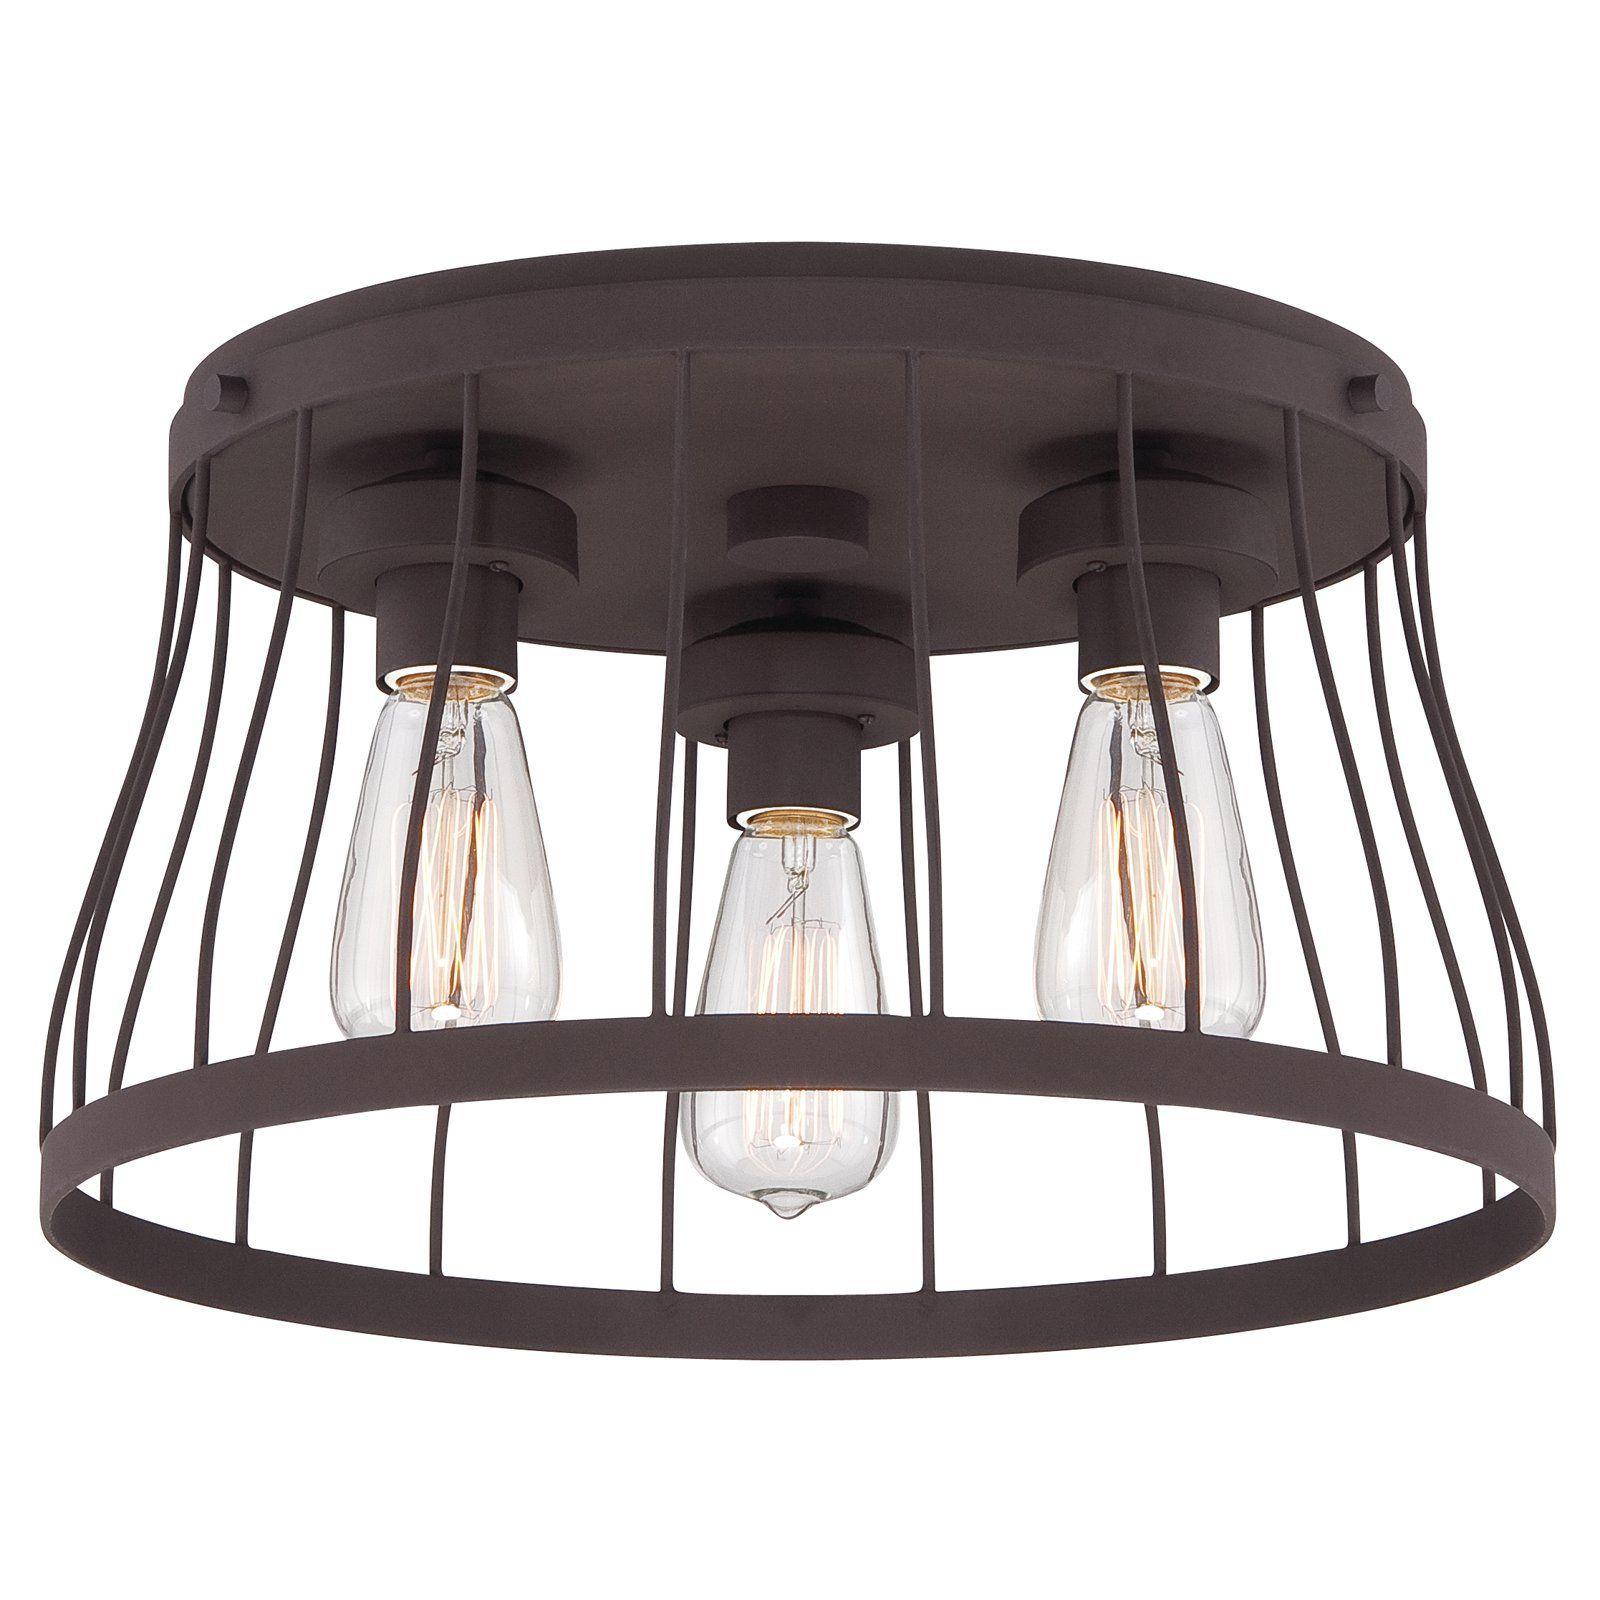 Designers fountain brooklyn 86821 flush mount light from